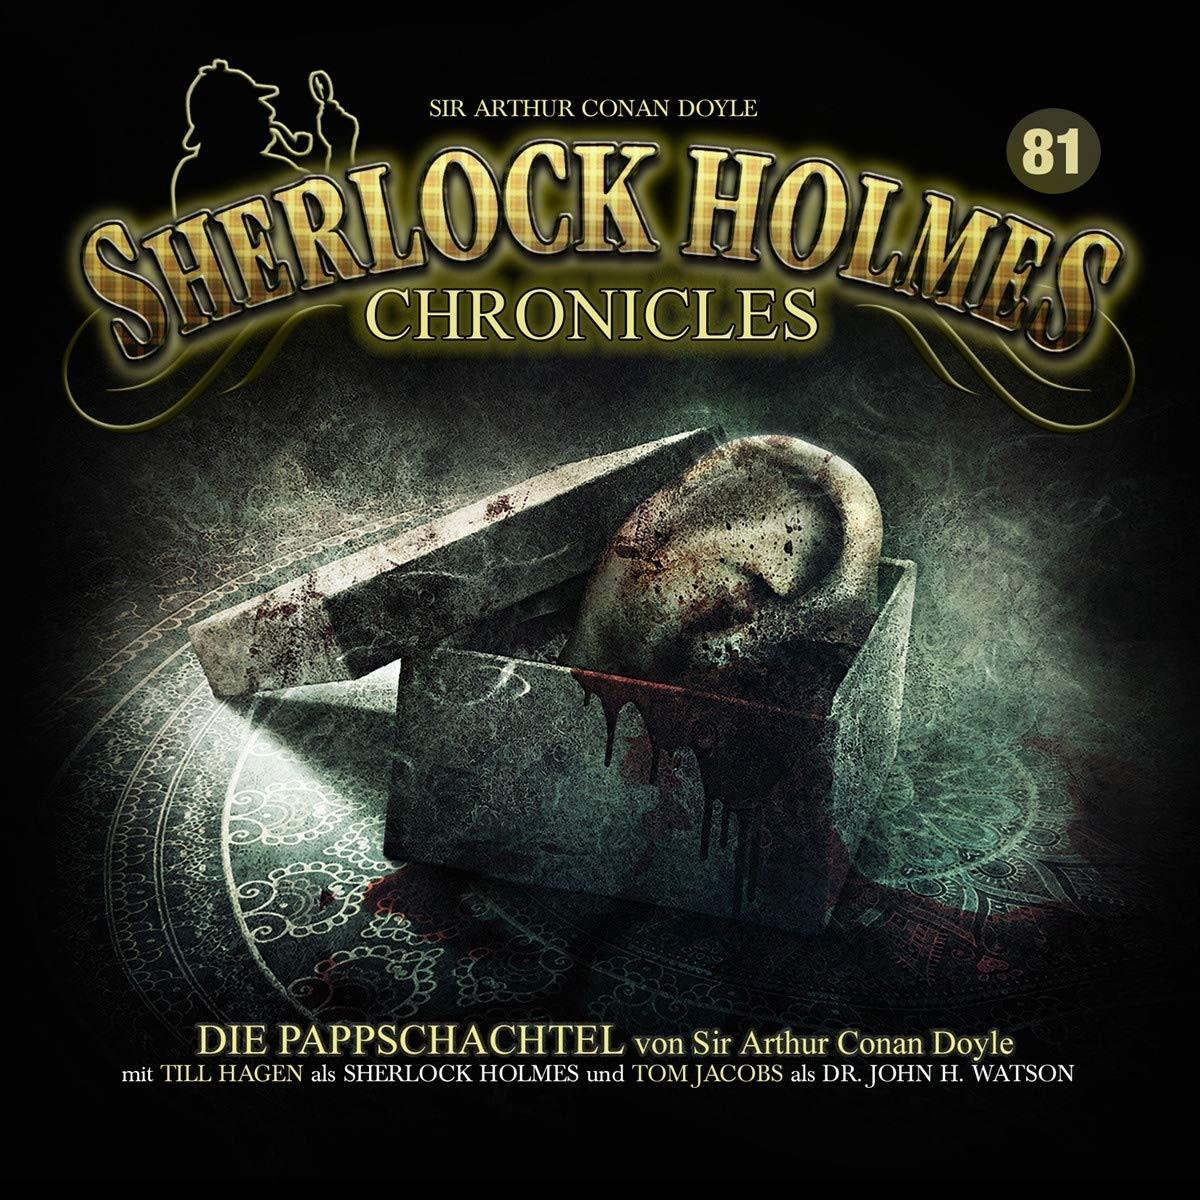 Sherlock Holmes Chronicles 81 Die Pappschachtel